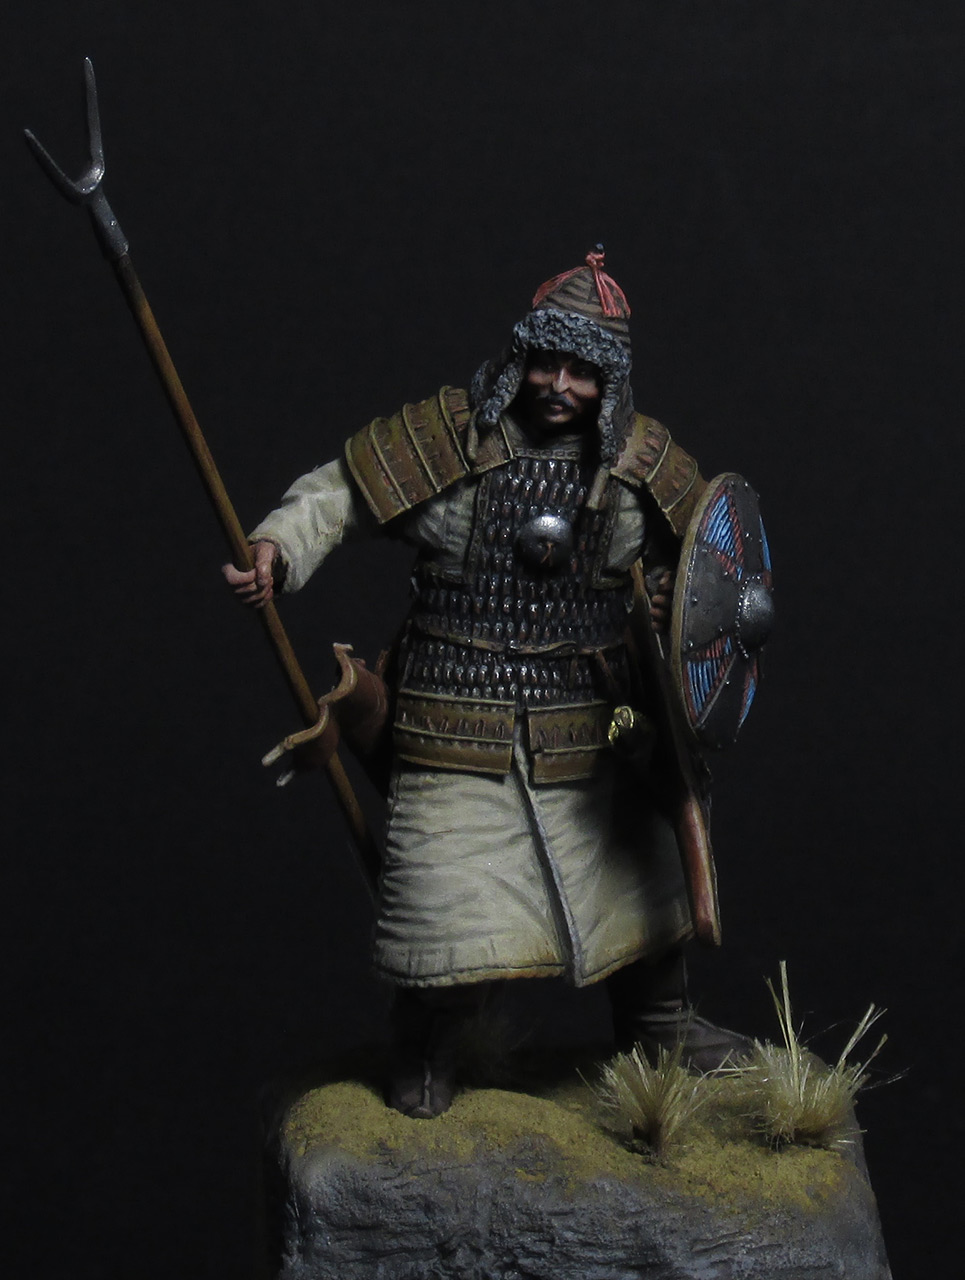 Figures: Khitan warrior, photo #1